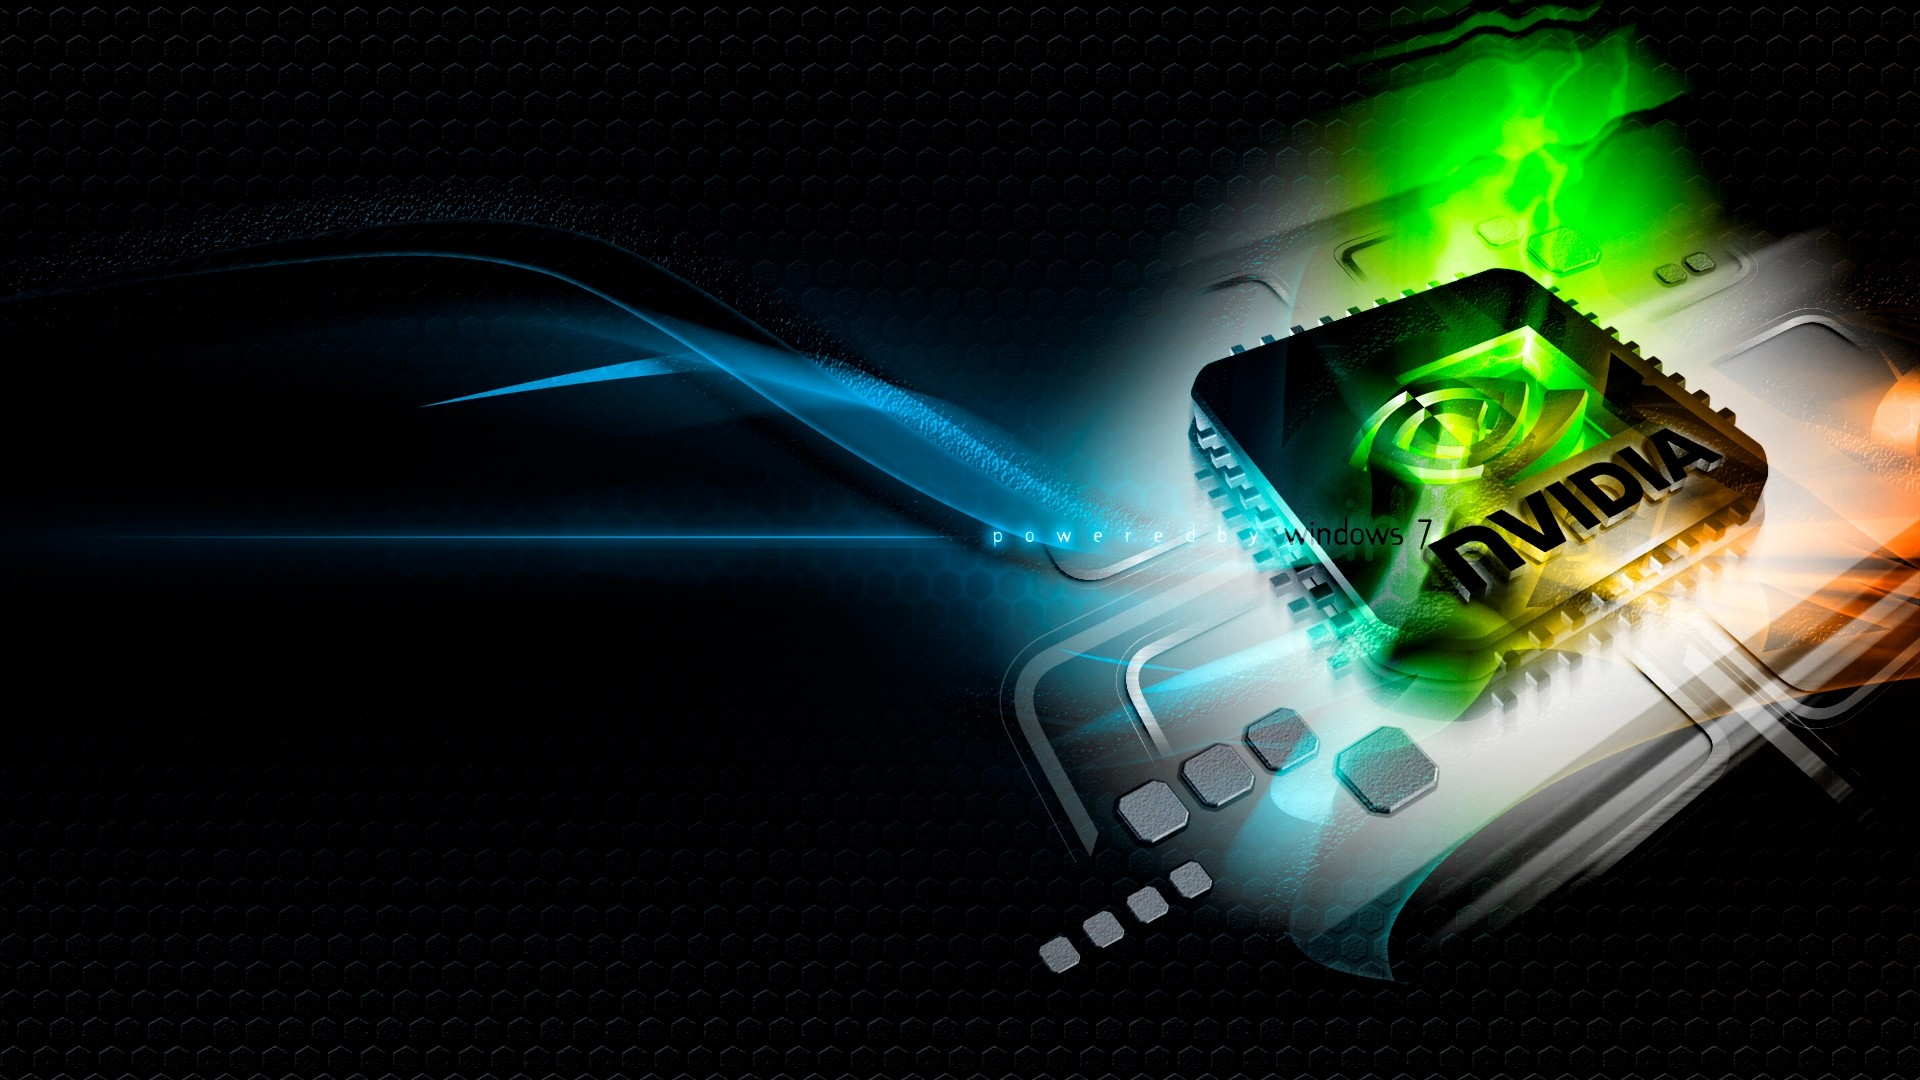 Windows 7 Nvidia Wallpaper   HD Wallpapers 1920x1080